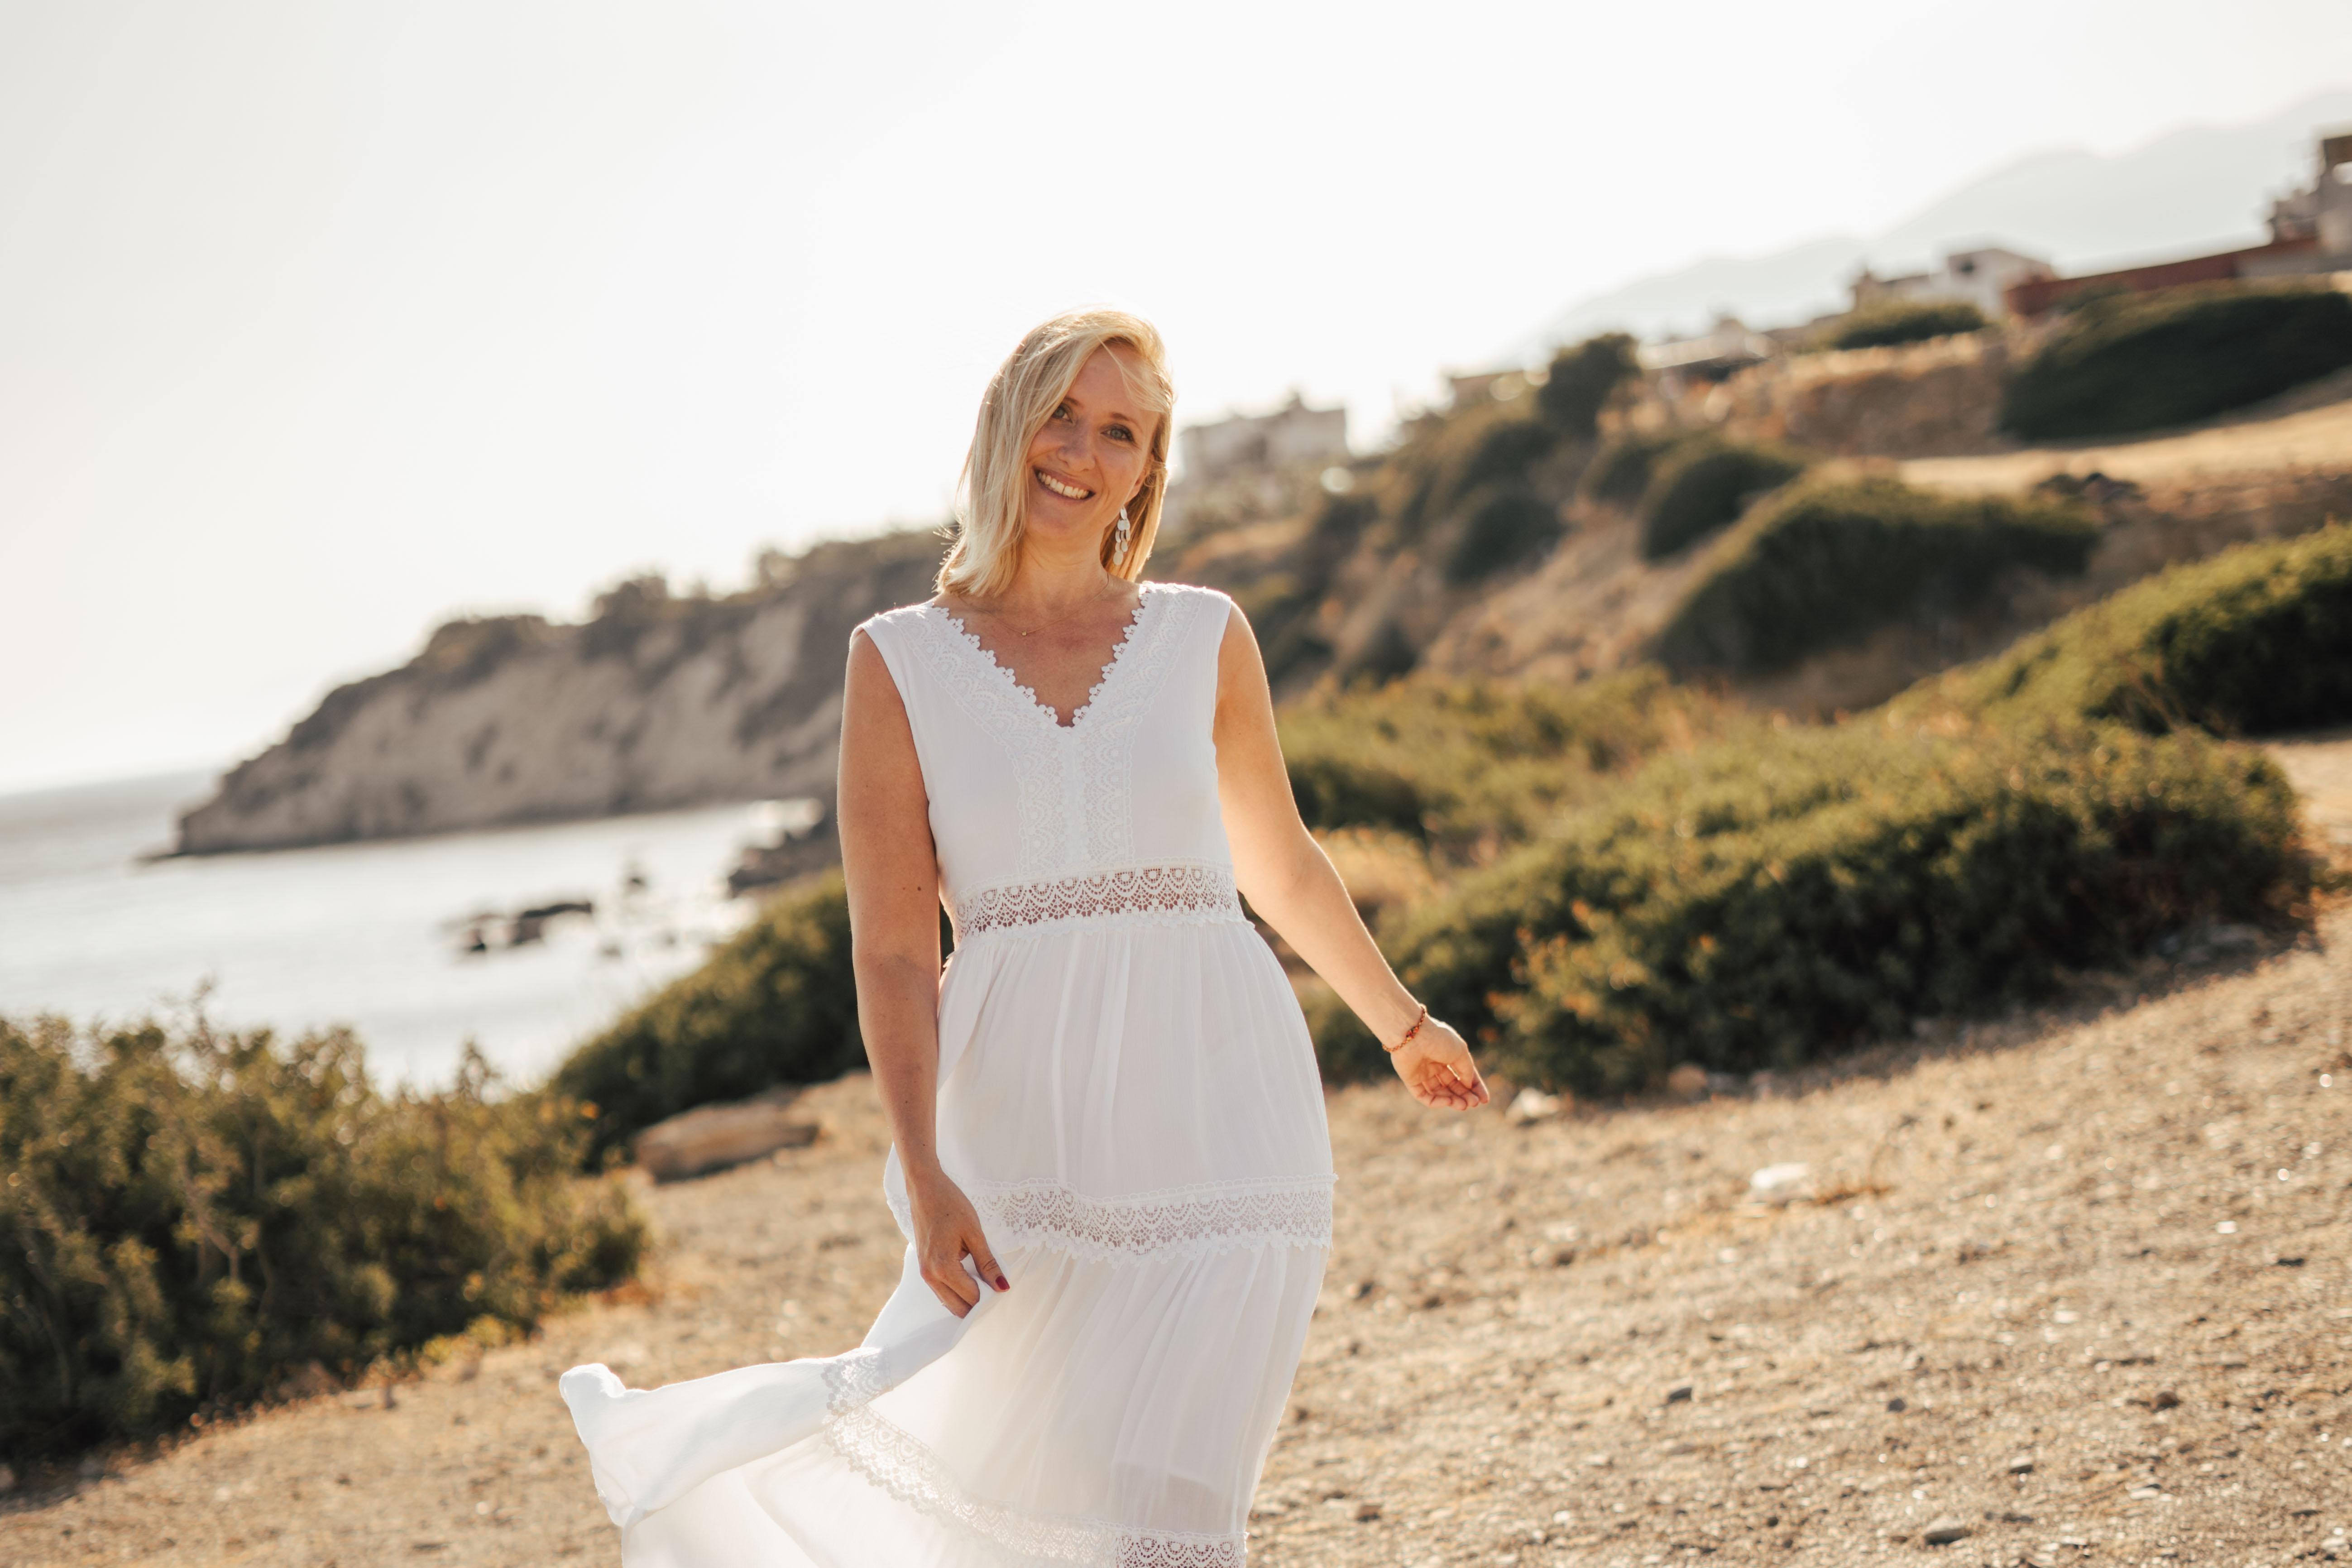 Fotografin Ella Keil aus Schloß Holte-Stukenbrock